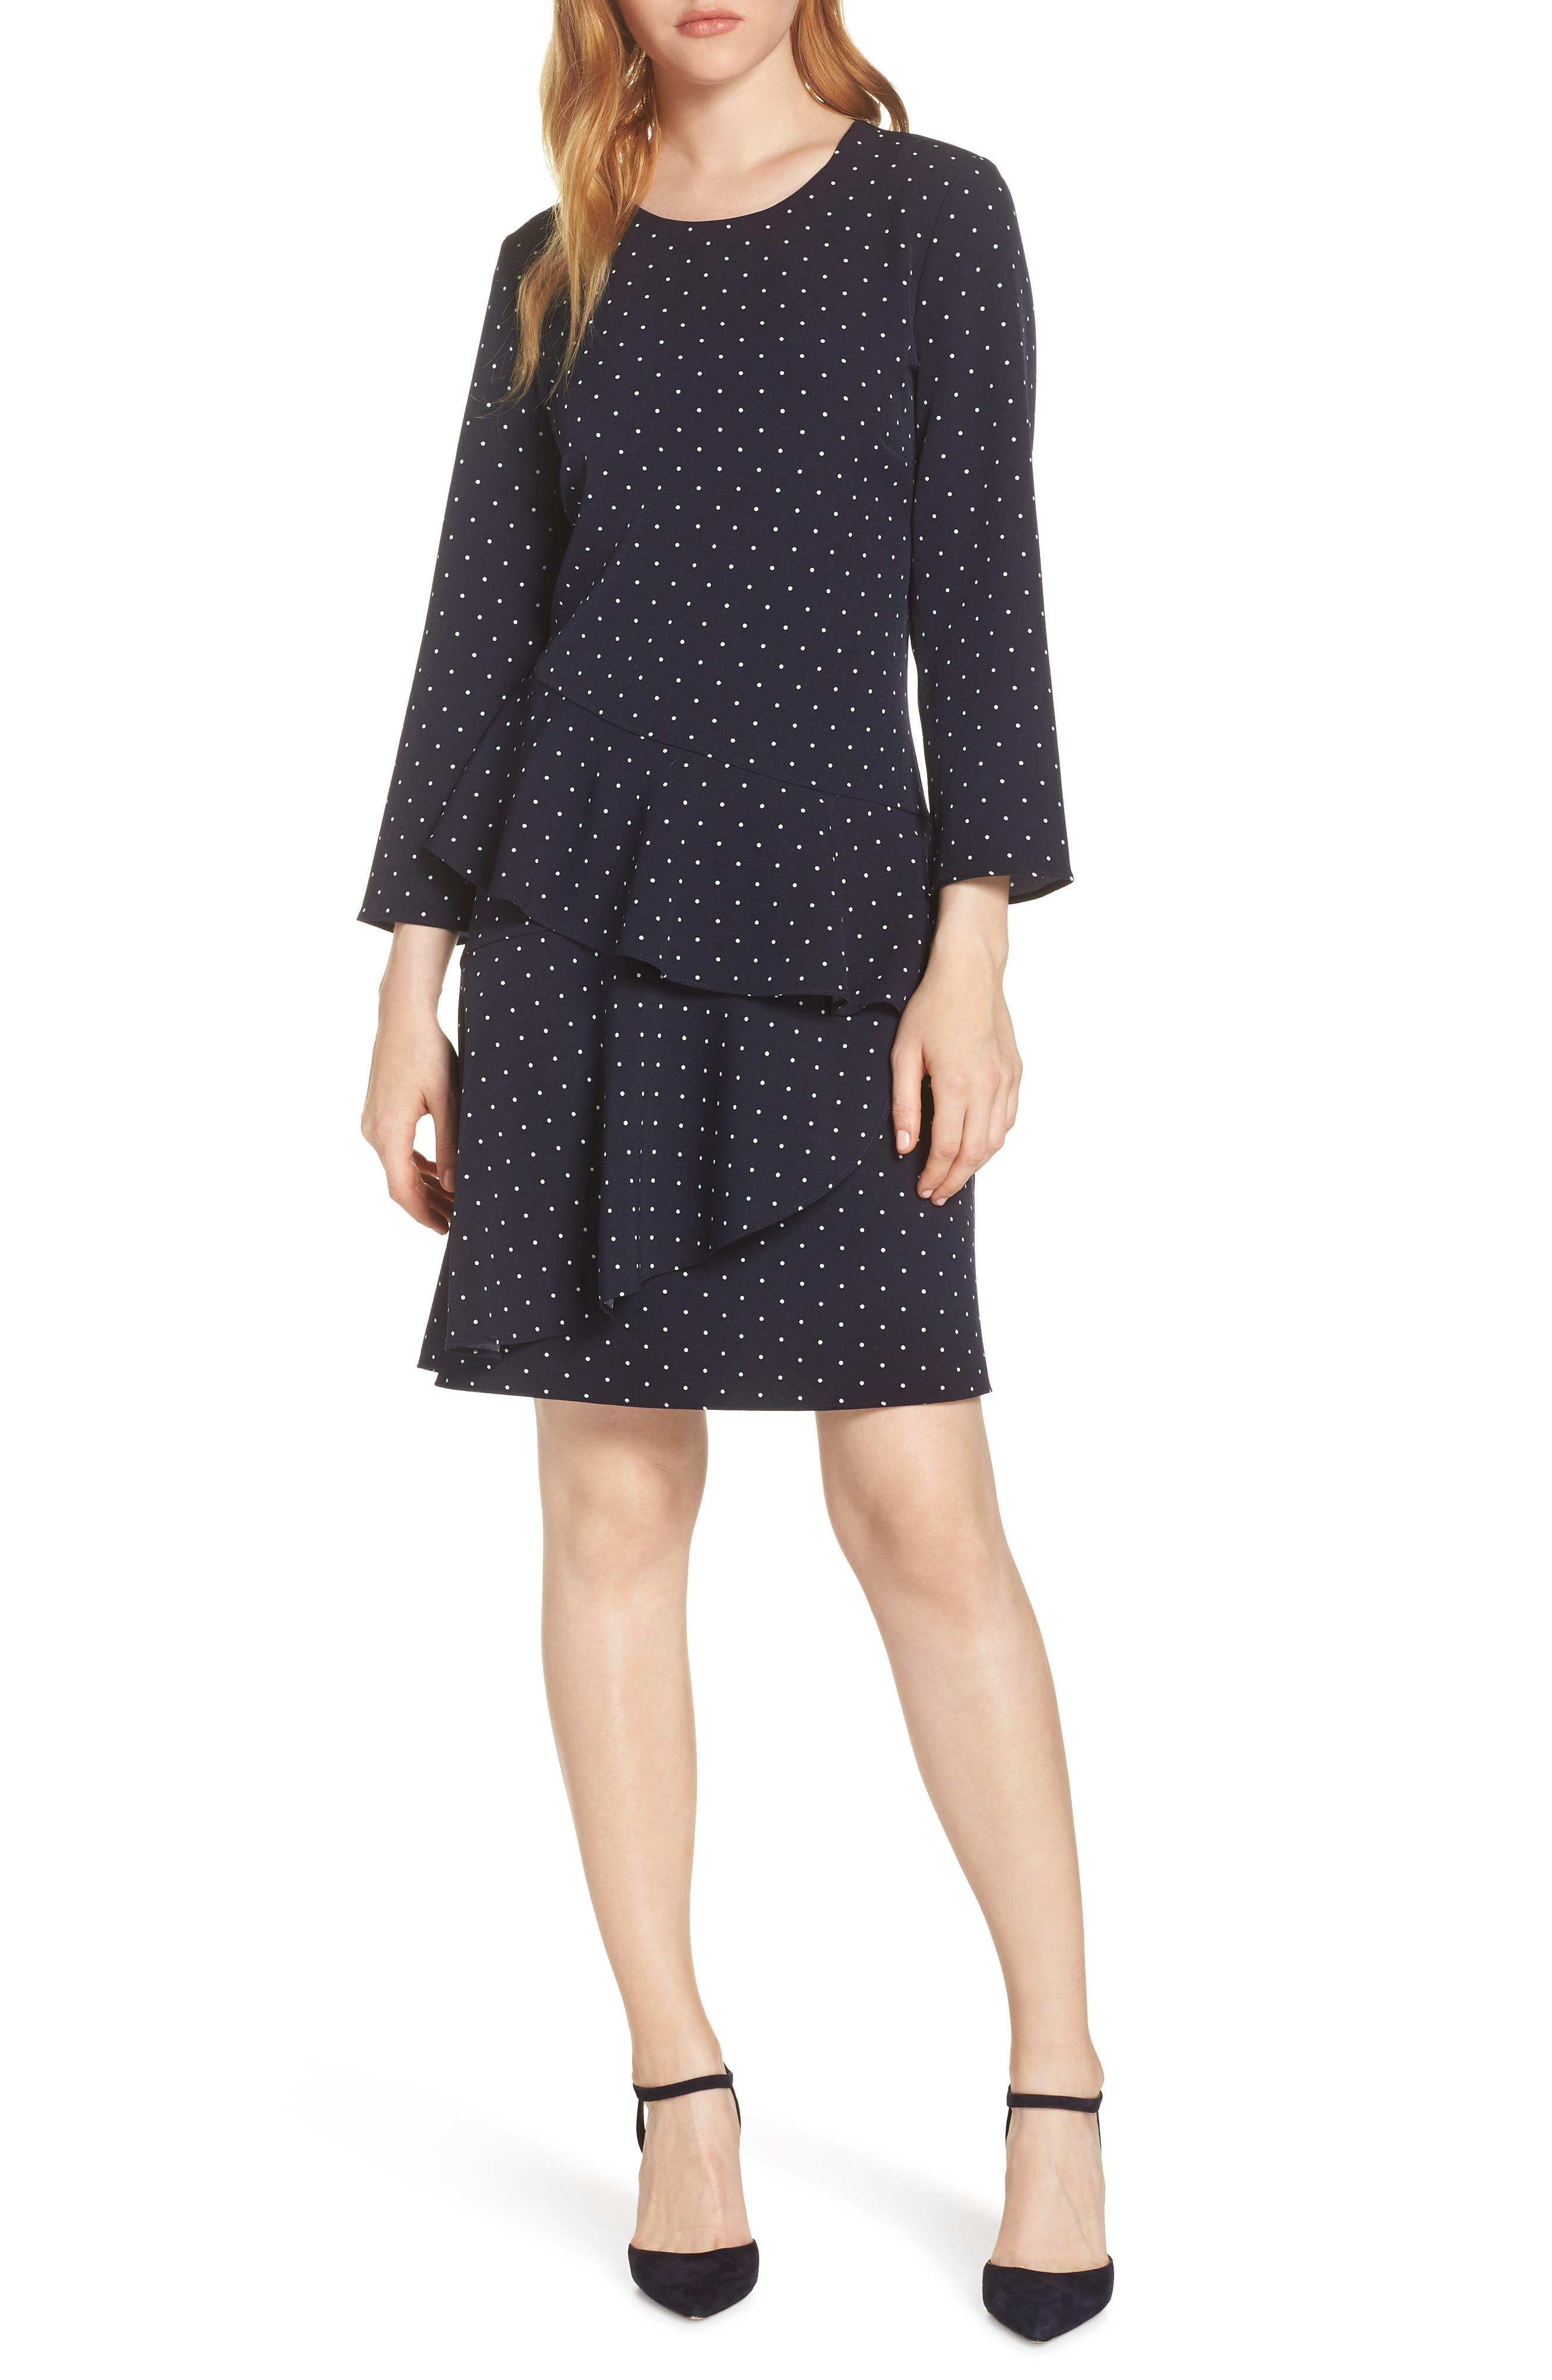 Polka Dot Dresses: 20s, 30s, 40s, 50s, 60s Petite Womens Eliza J Tiered Drop Waist Dress Size 2P - Blue $128.00 AT vintagedancer.com